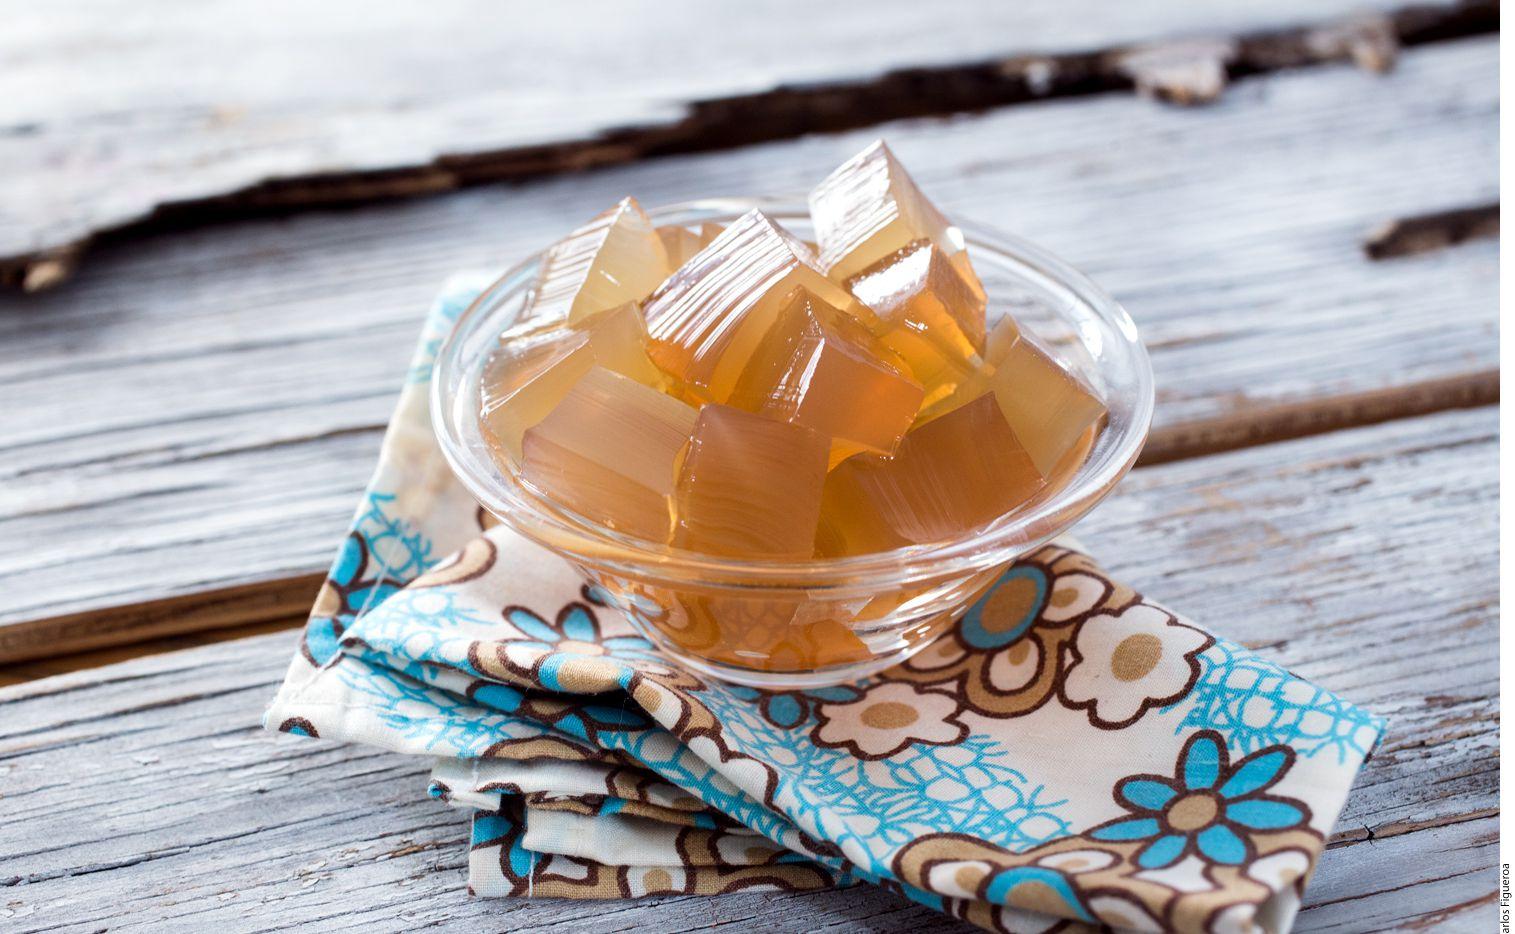 Rica gelatina de té verde. AGENCIA REFORMA.